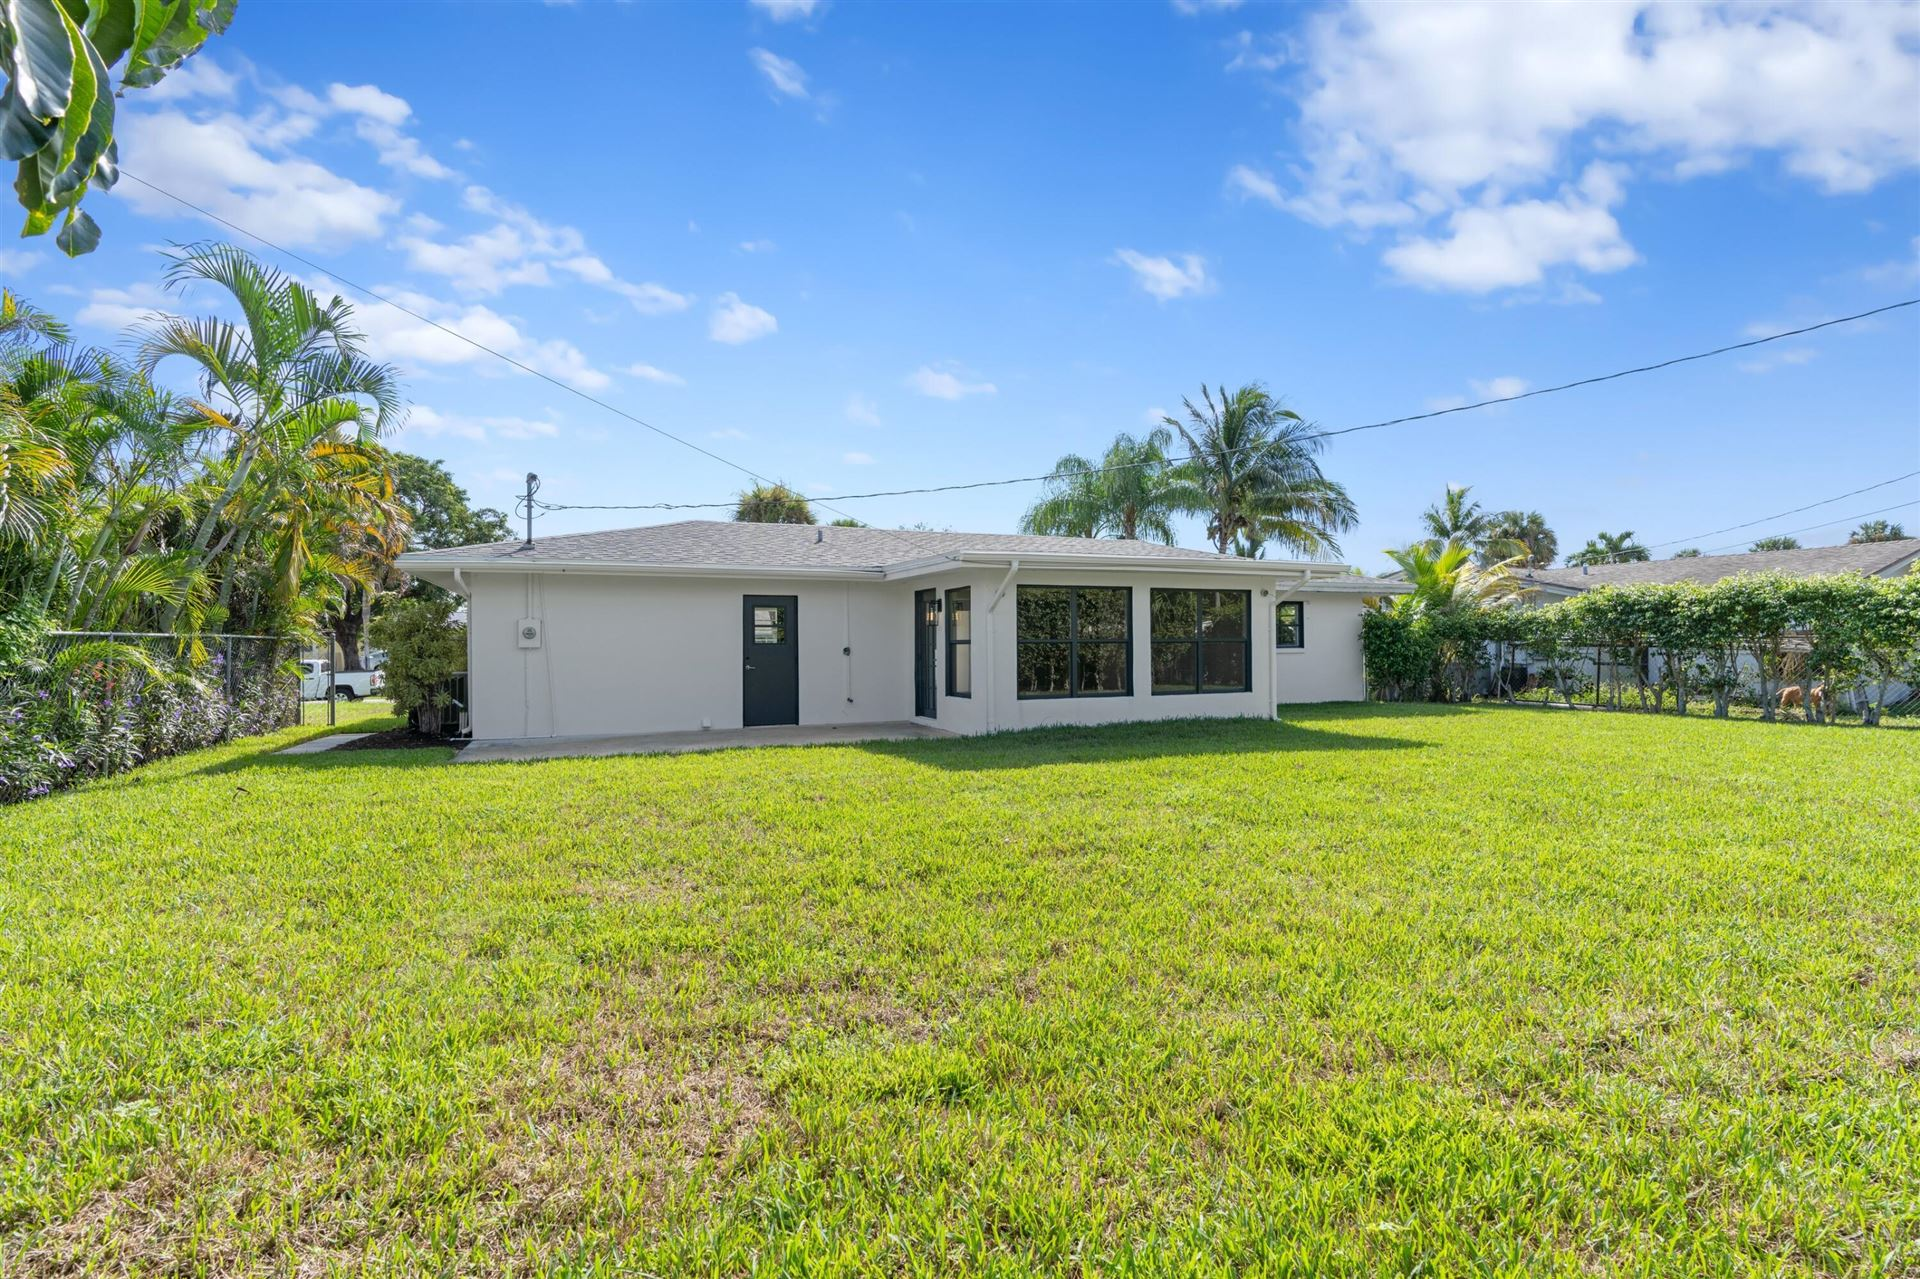 Photo of 9943 Dogwood Avenue, Palm Beach Gardens, FL 33410 (MLS # RX-10746258)